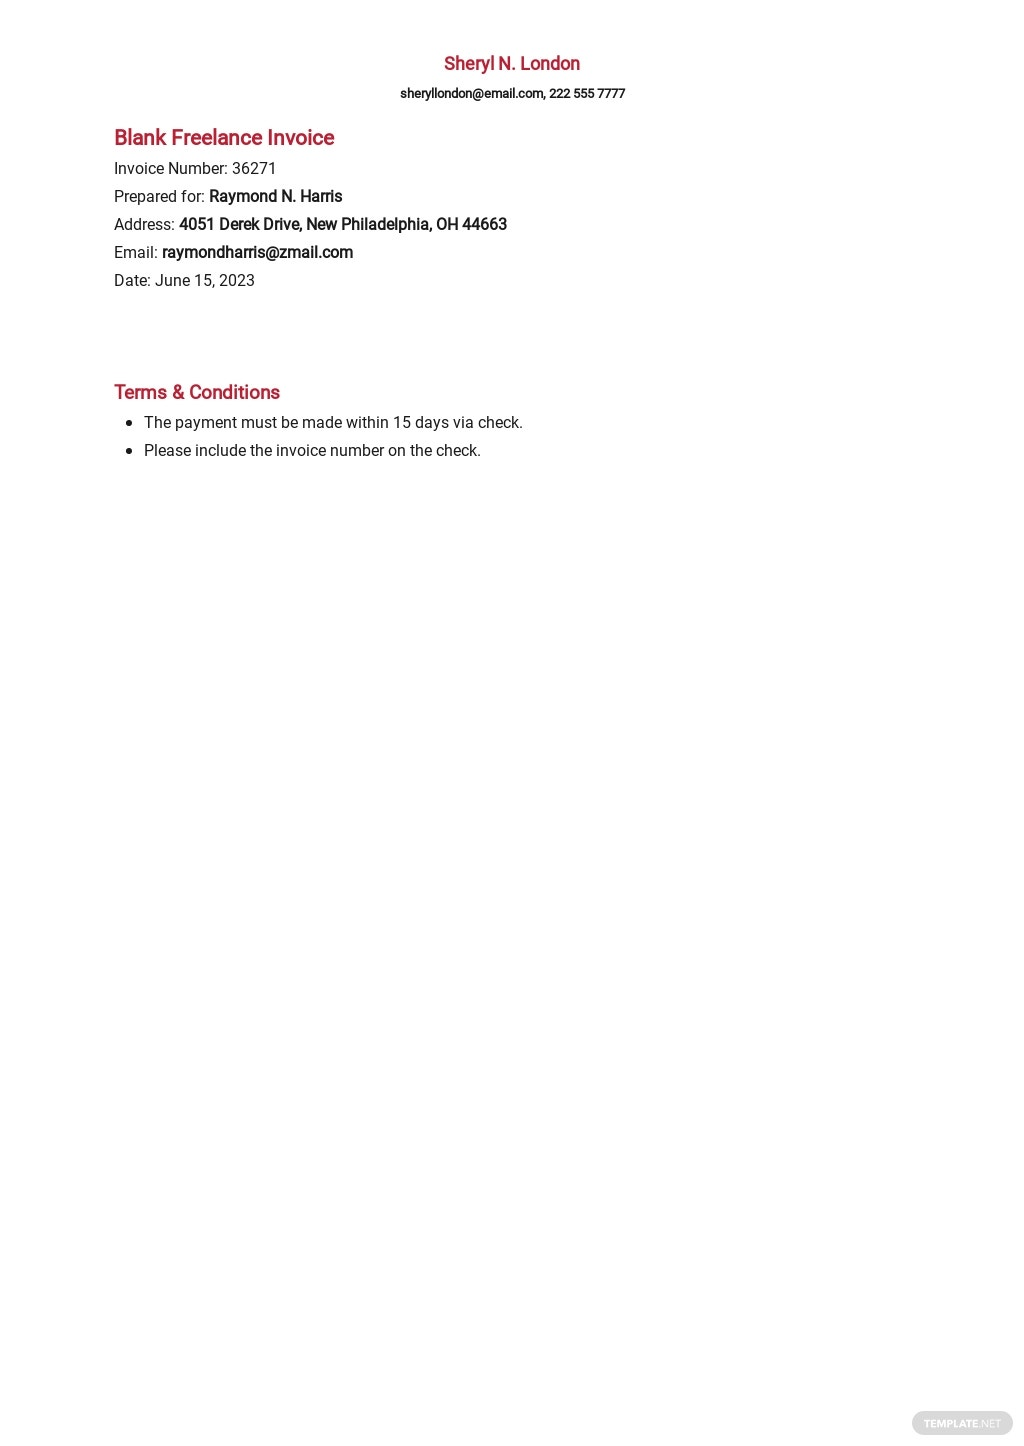 Blank Freelance Invoice Template